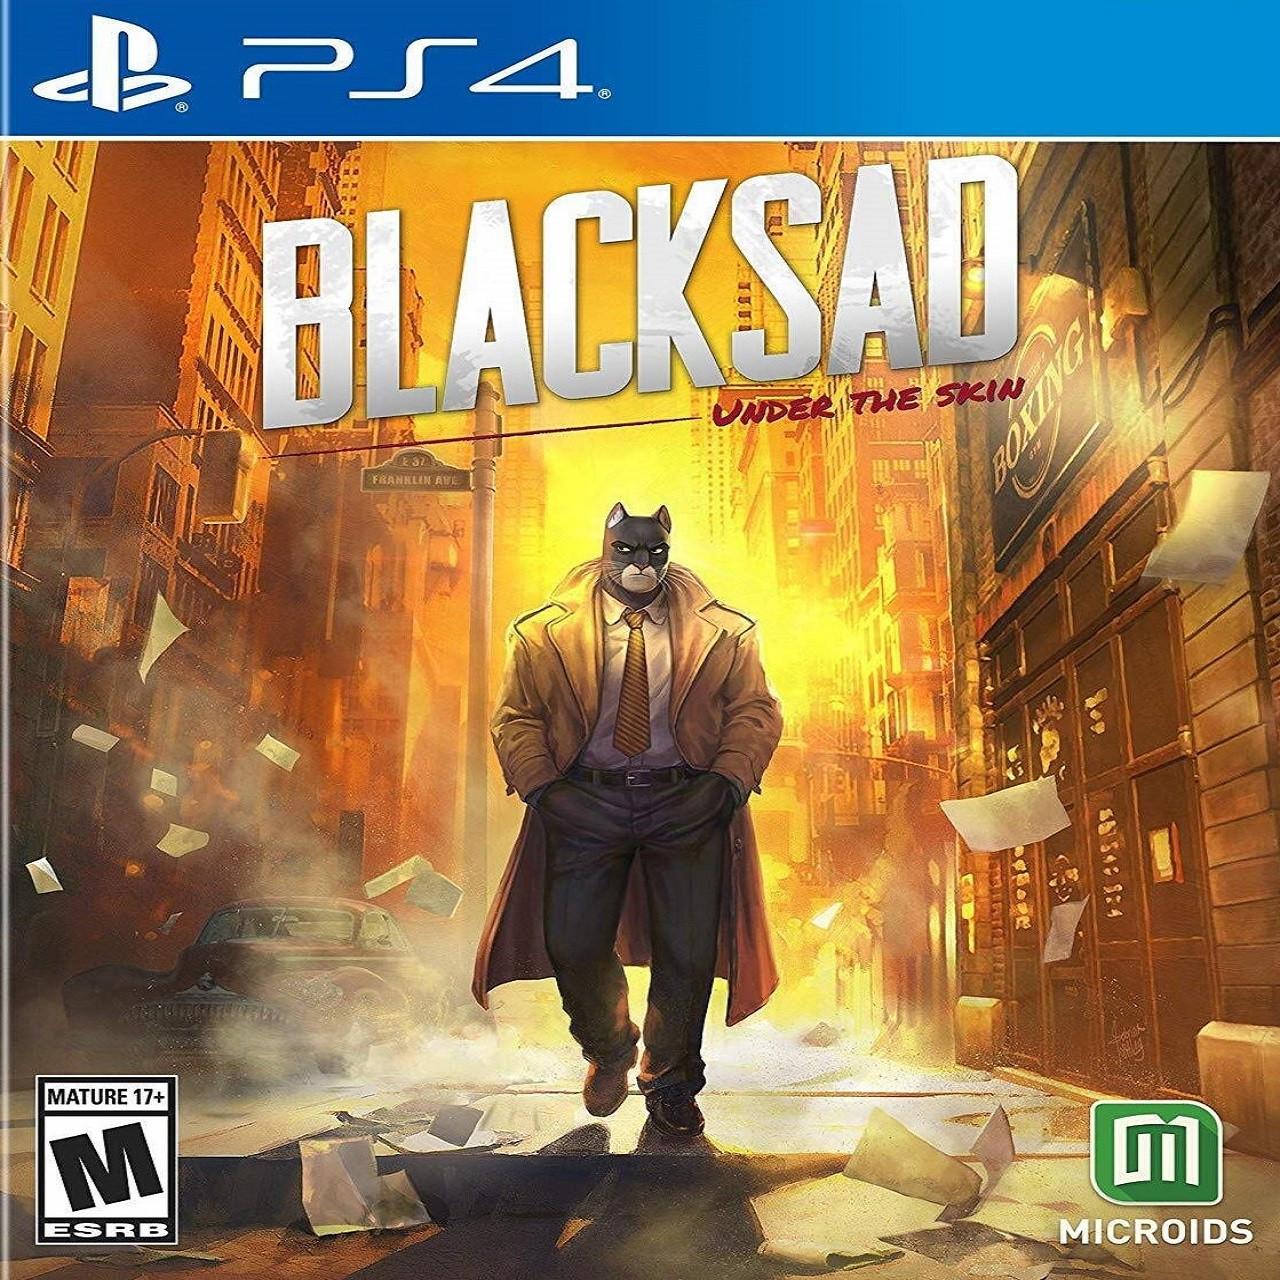 BLACKSAD: Under the Skin Limited Edition ENG PS4 (NEW)